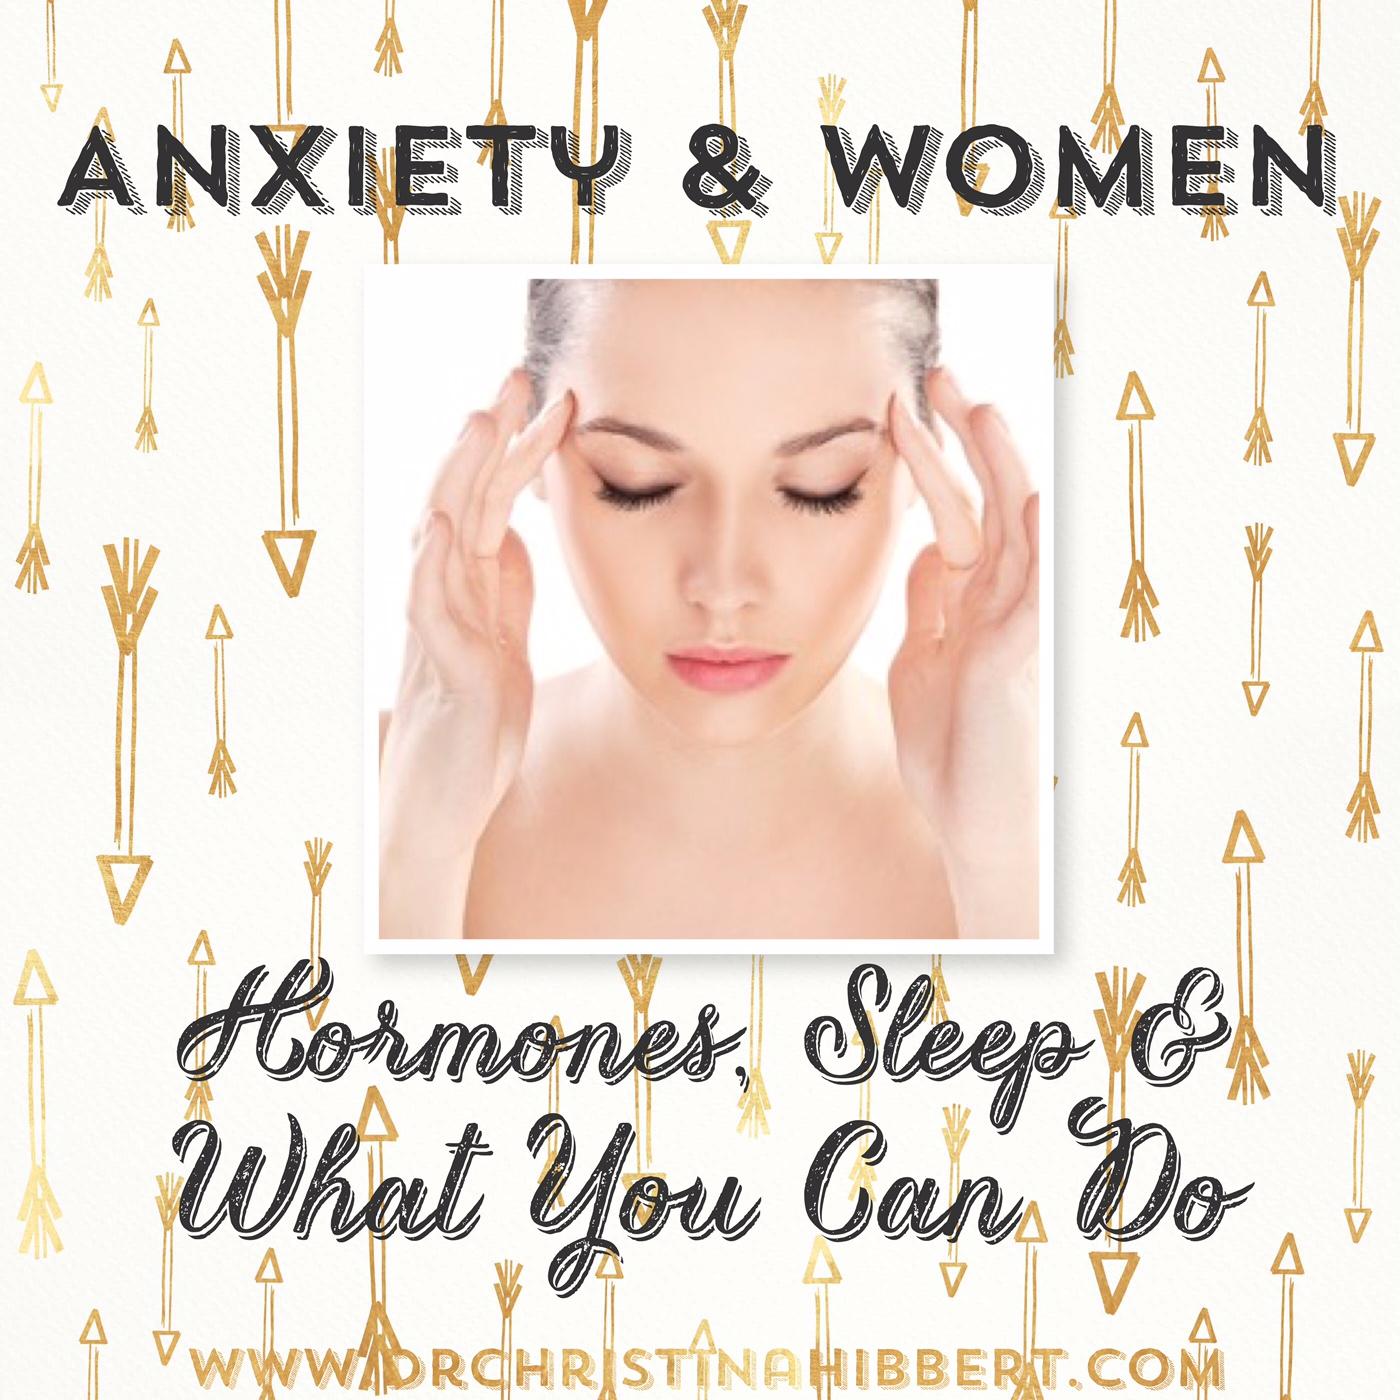 Nervous system: nervousness in women 35